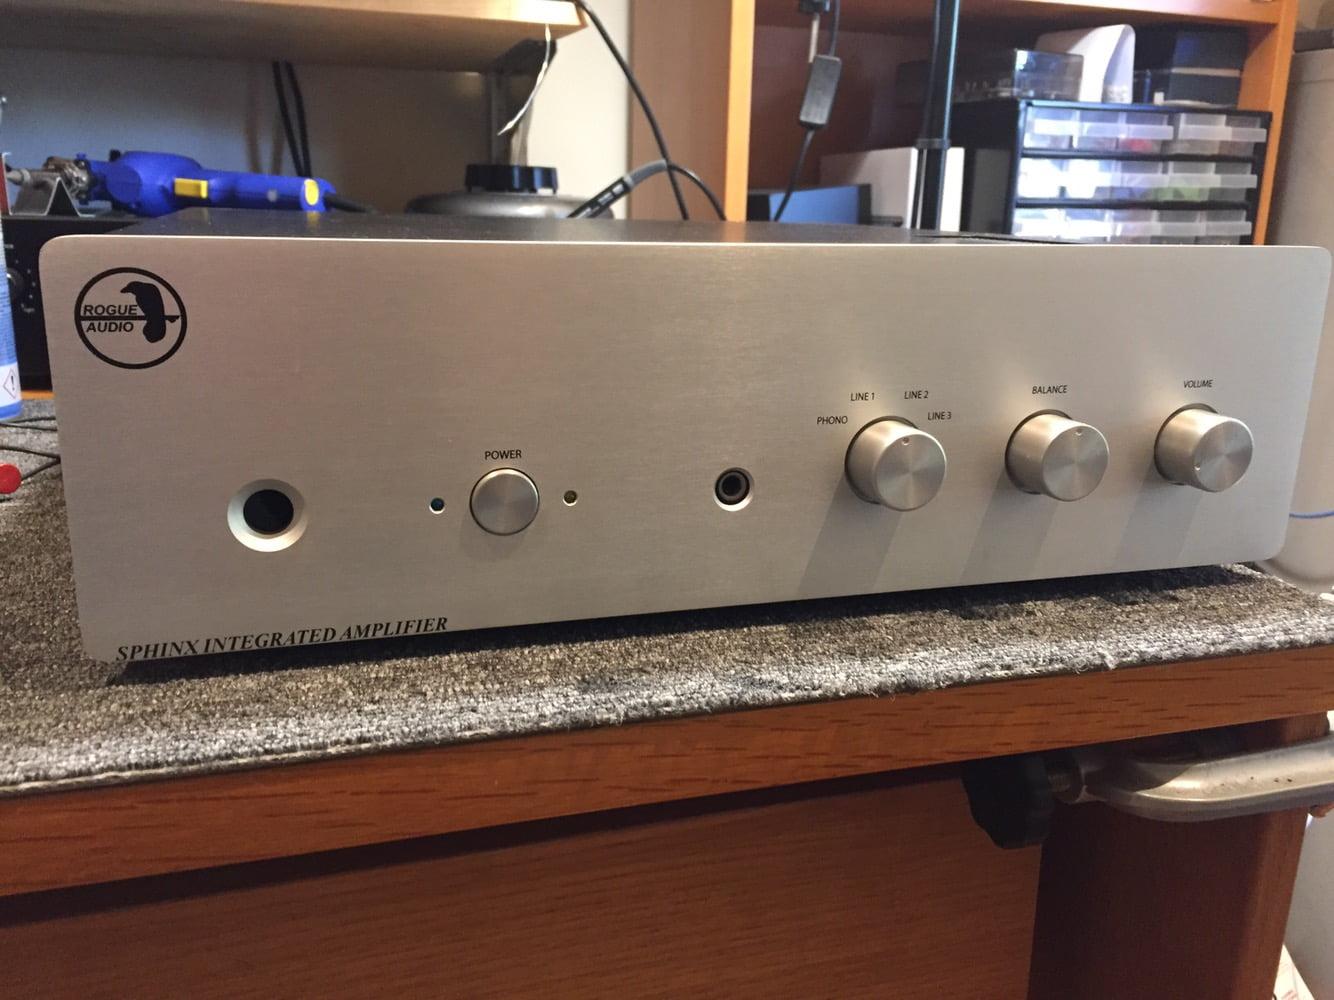 Rogue Audio Sphinx Integrated Amplifier Repair